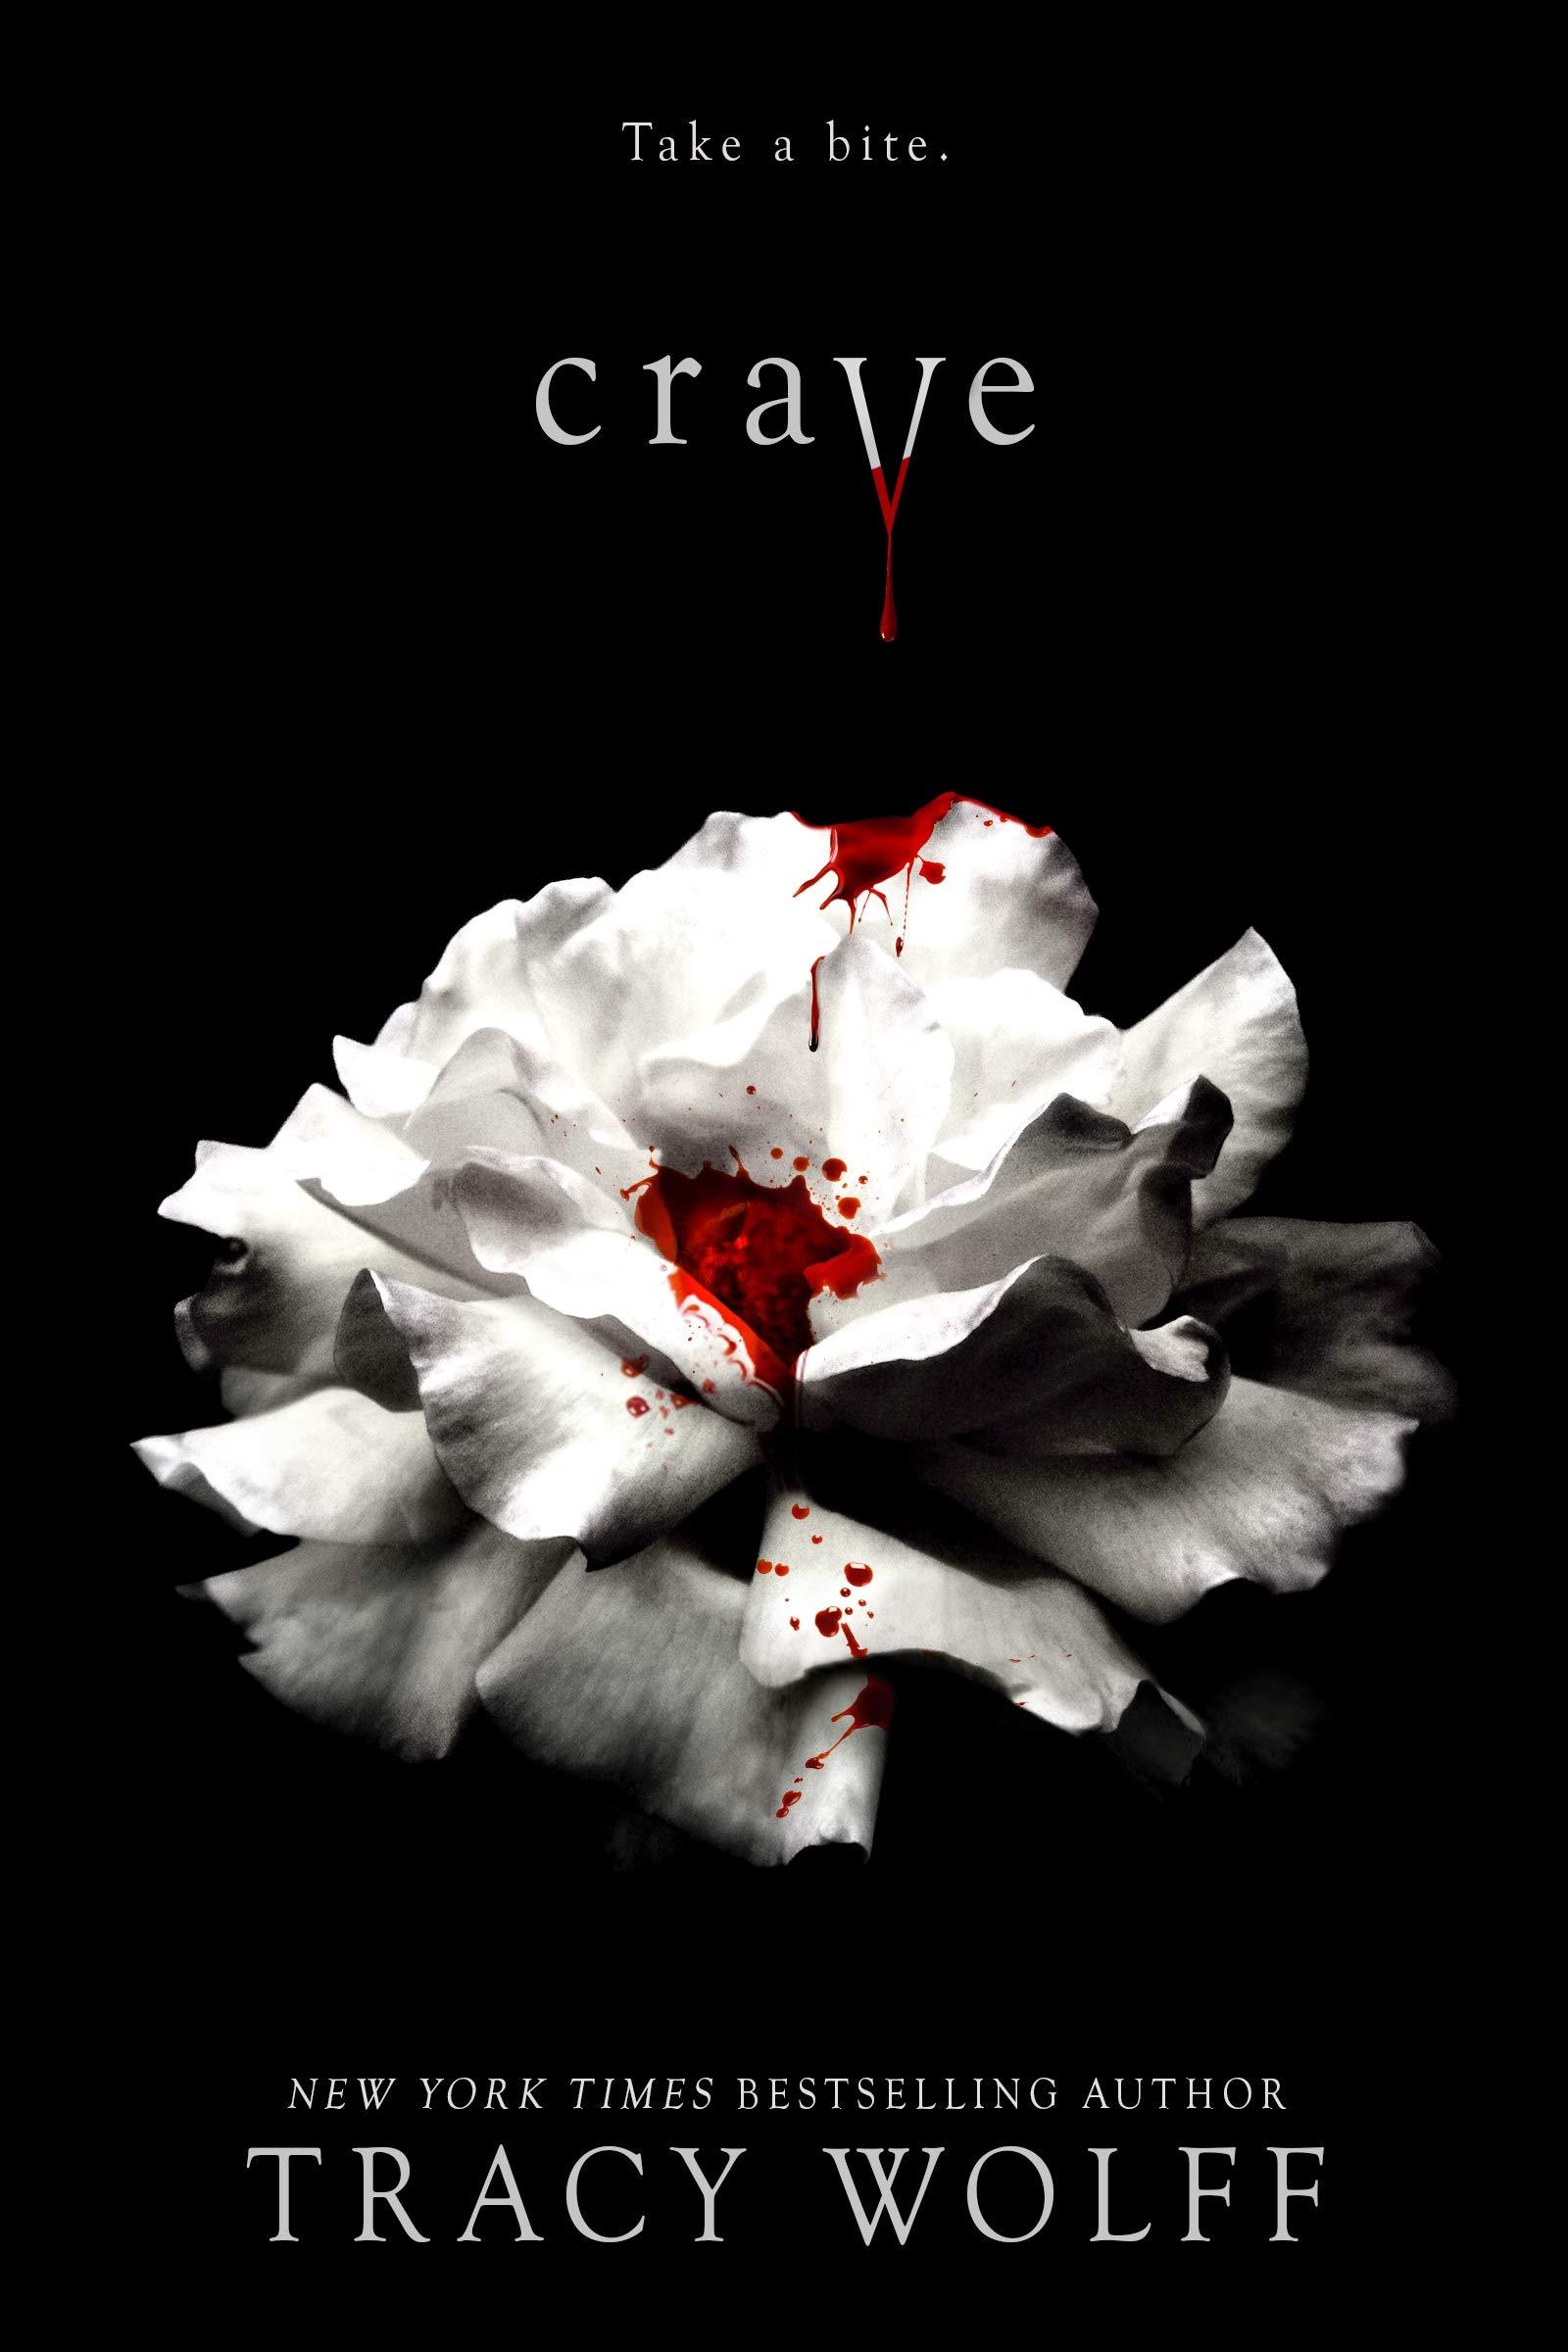 Amazon.com: Crave (Crave, 1) (9781640638952): Wolff, Tracy: Books